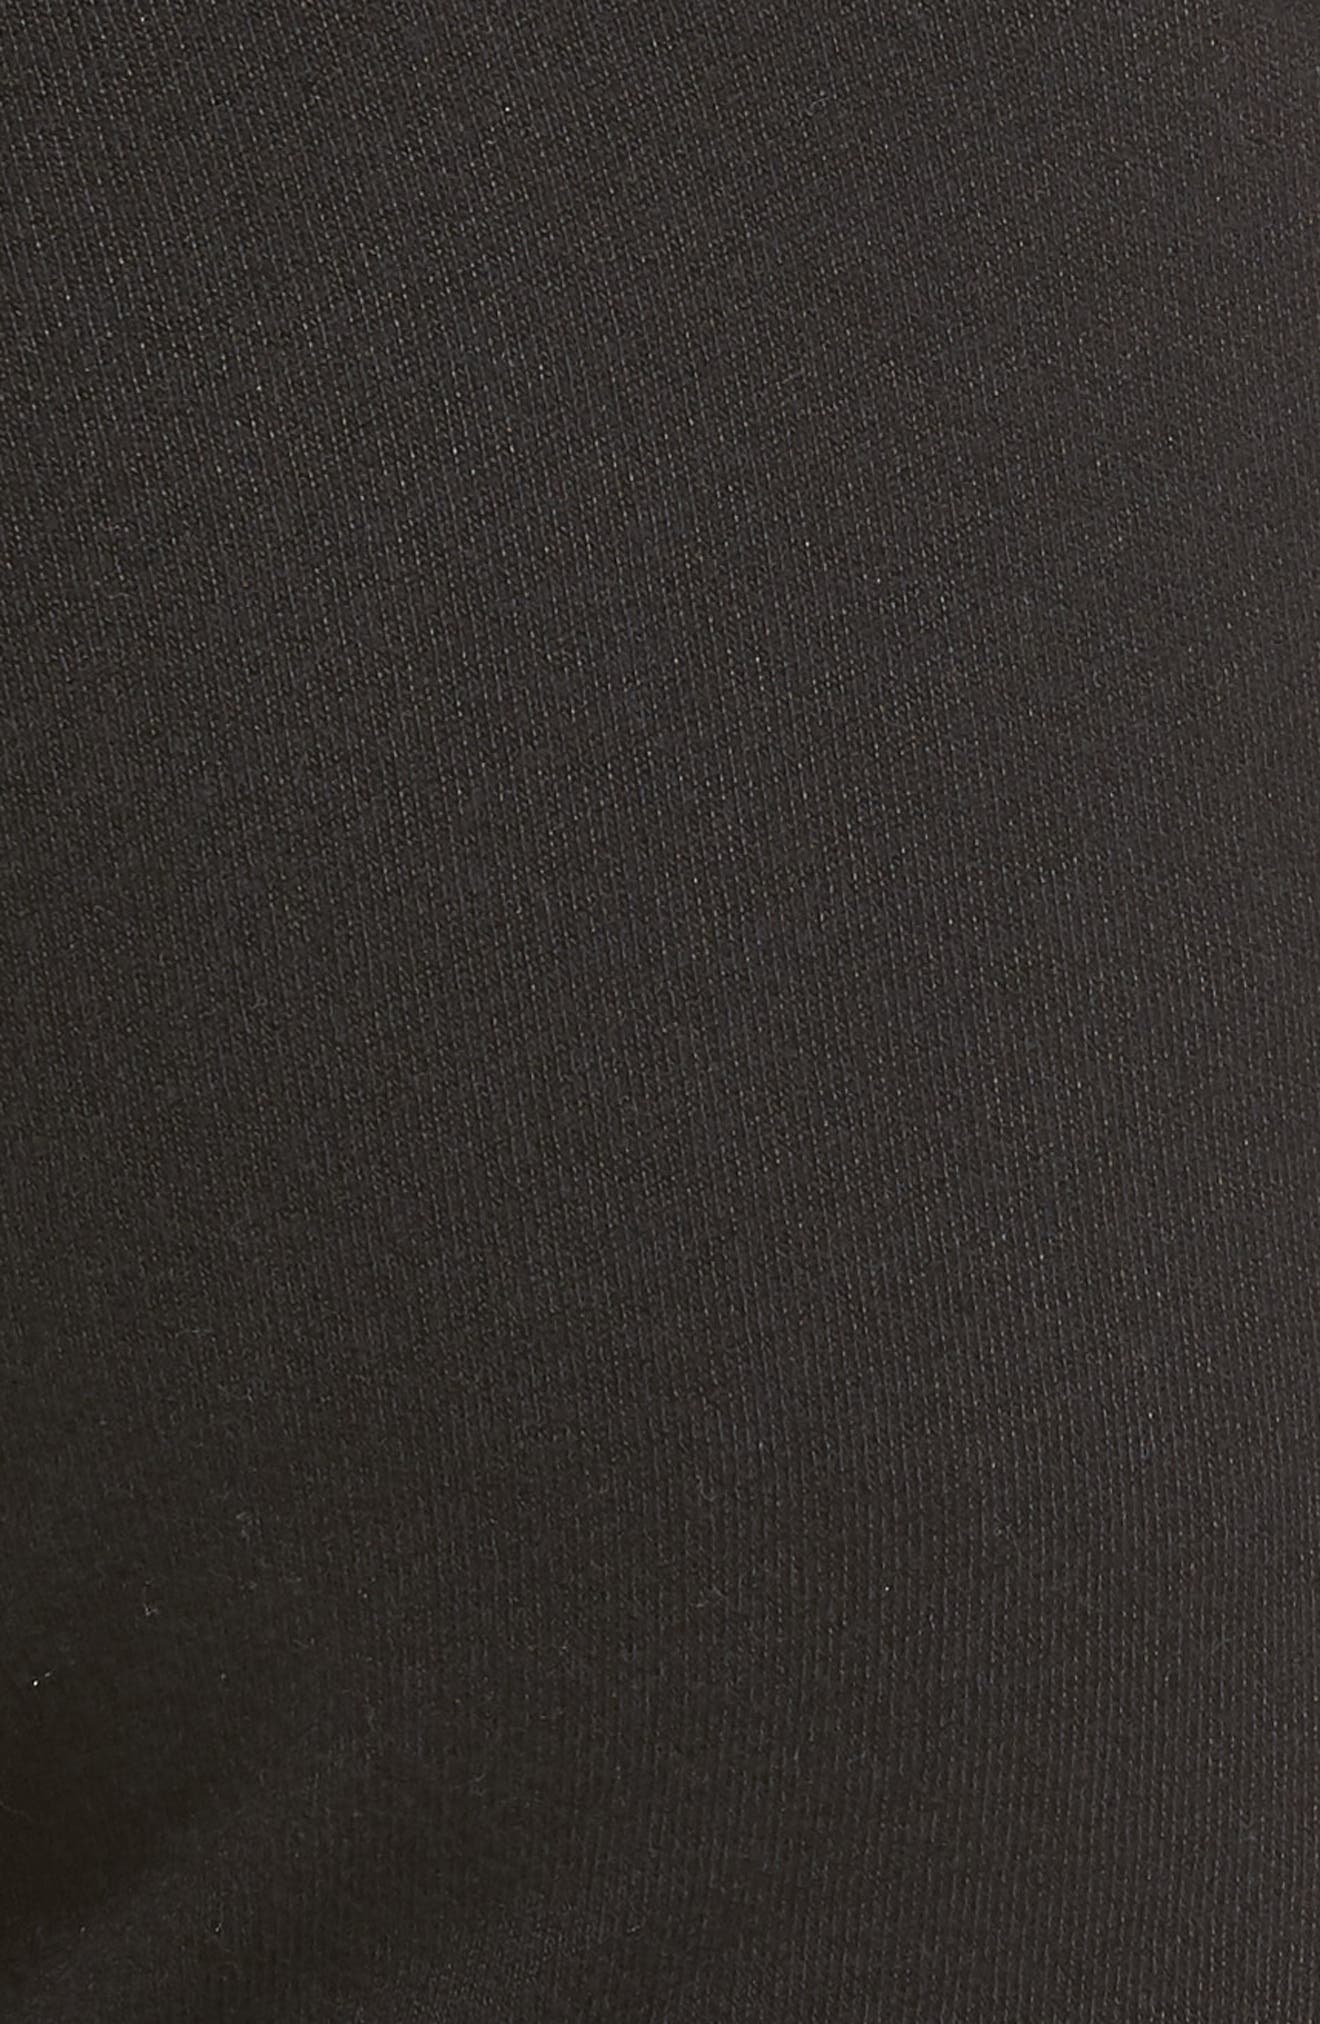 Joss Studded Sweatpants,                             Alternate thumbnail 5, color,                             001